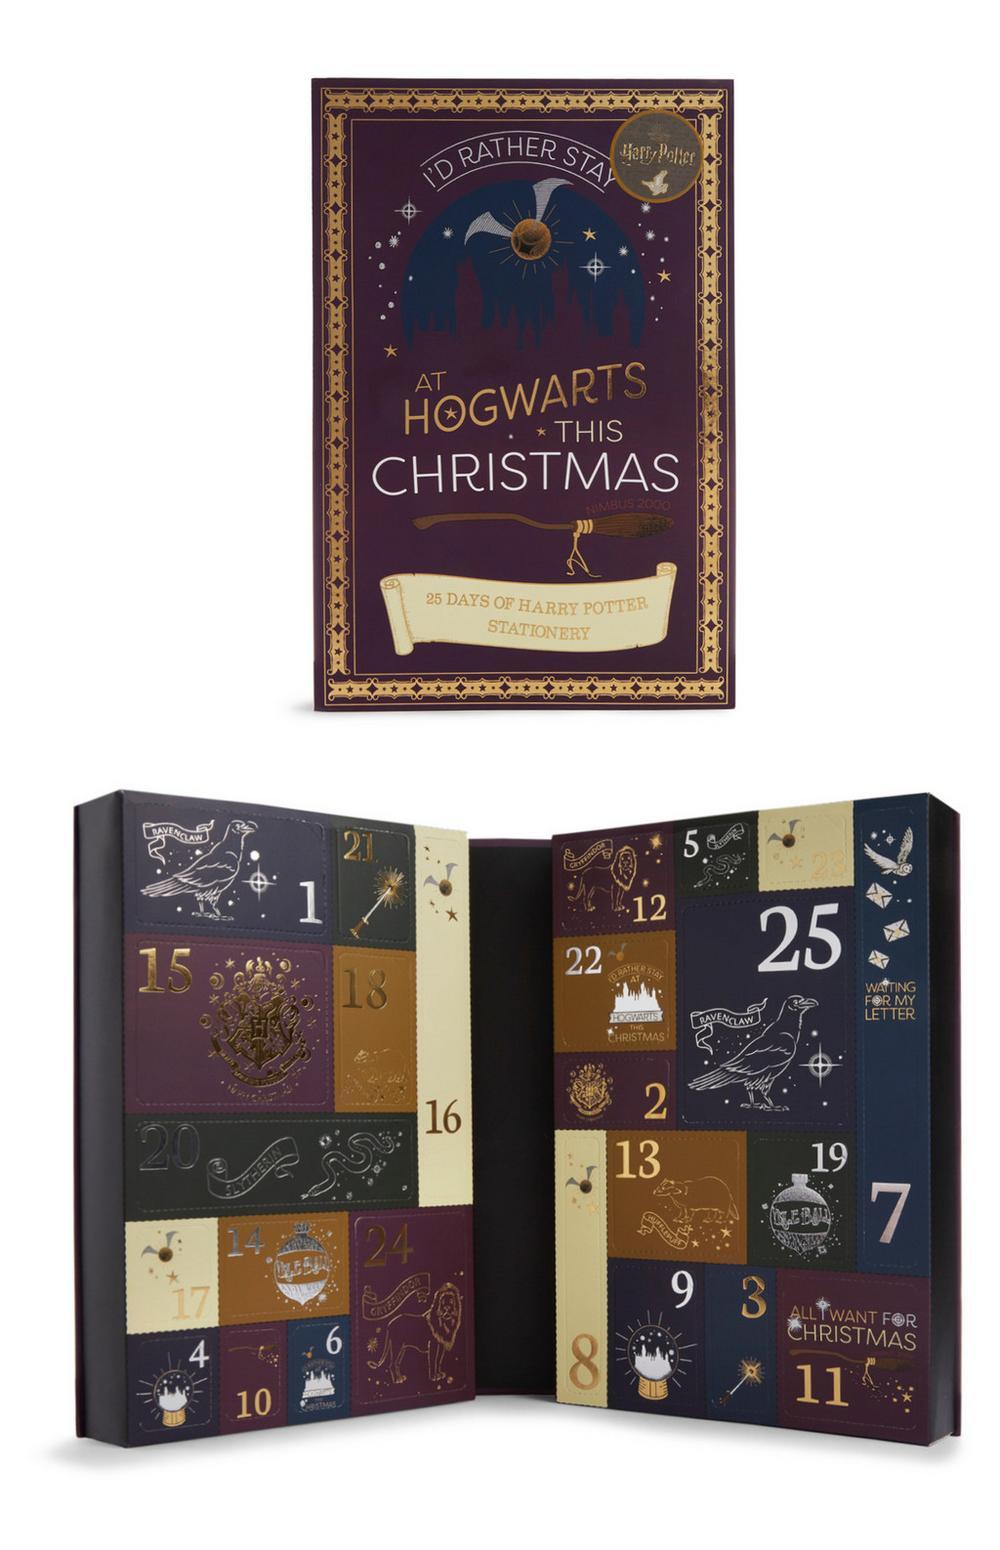 Calendario de Harry Potter